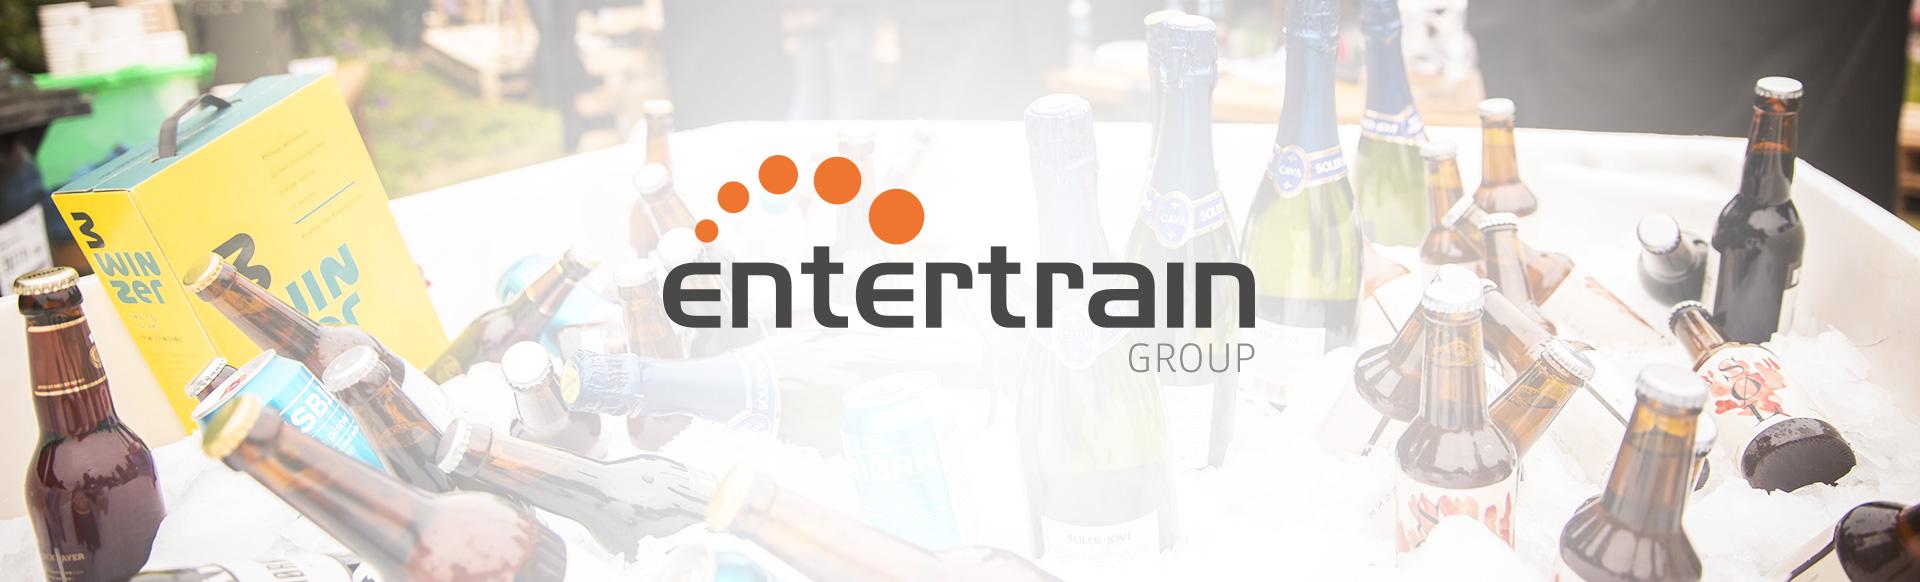 Entertrain-smallbanner-20